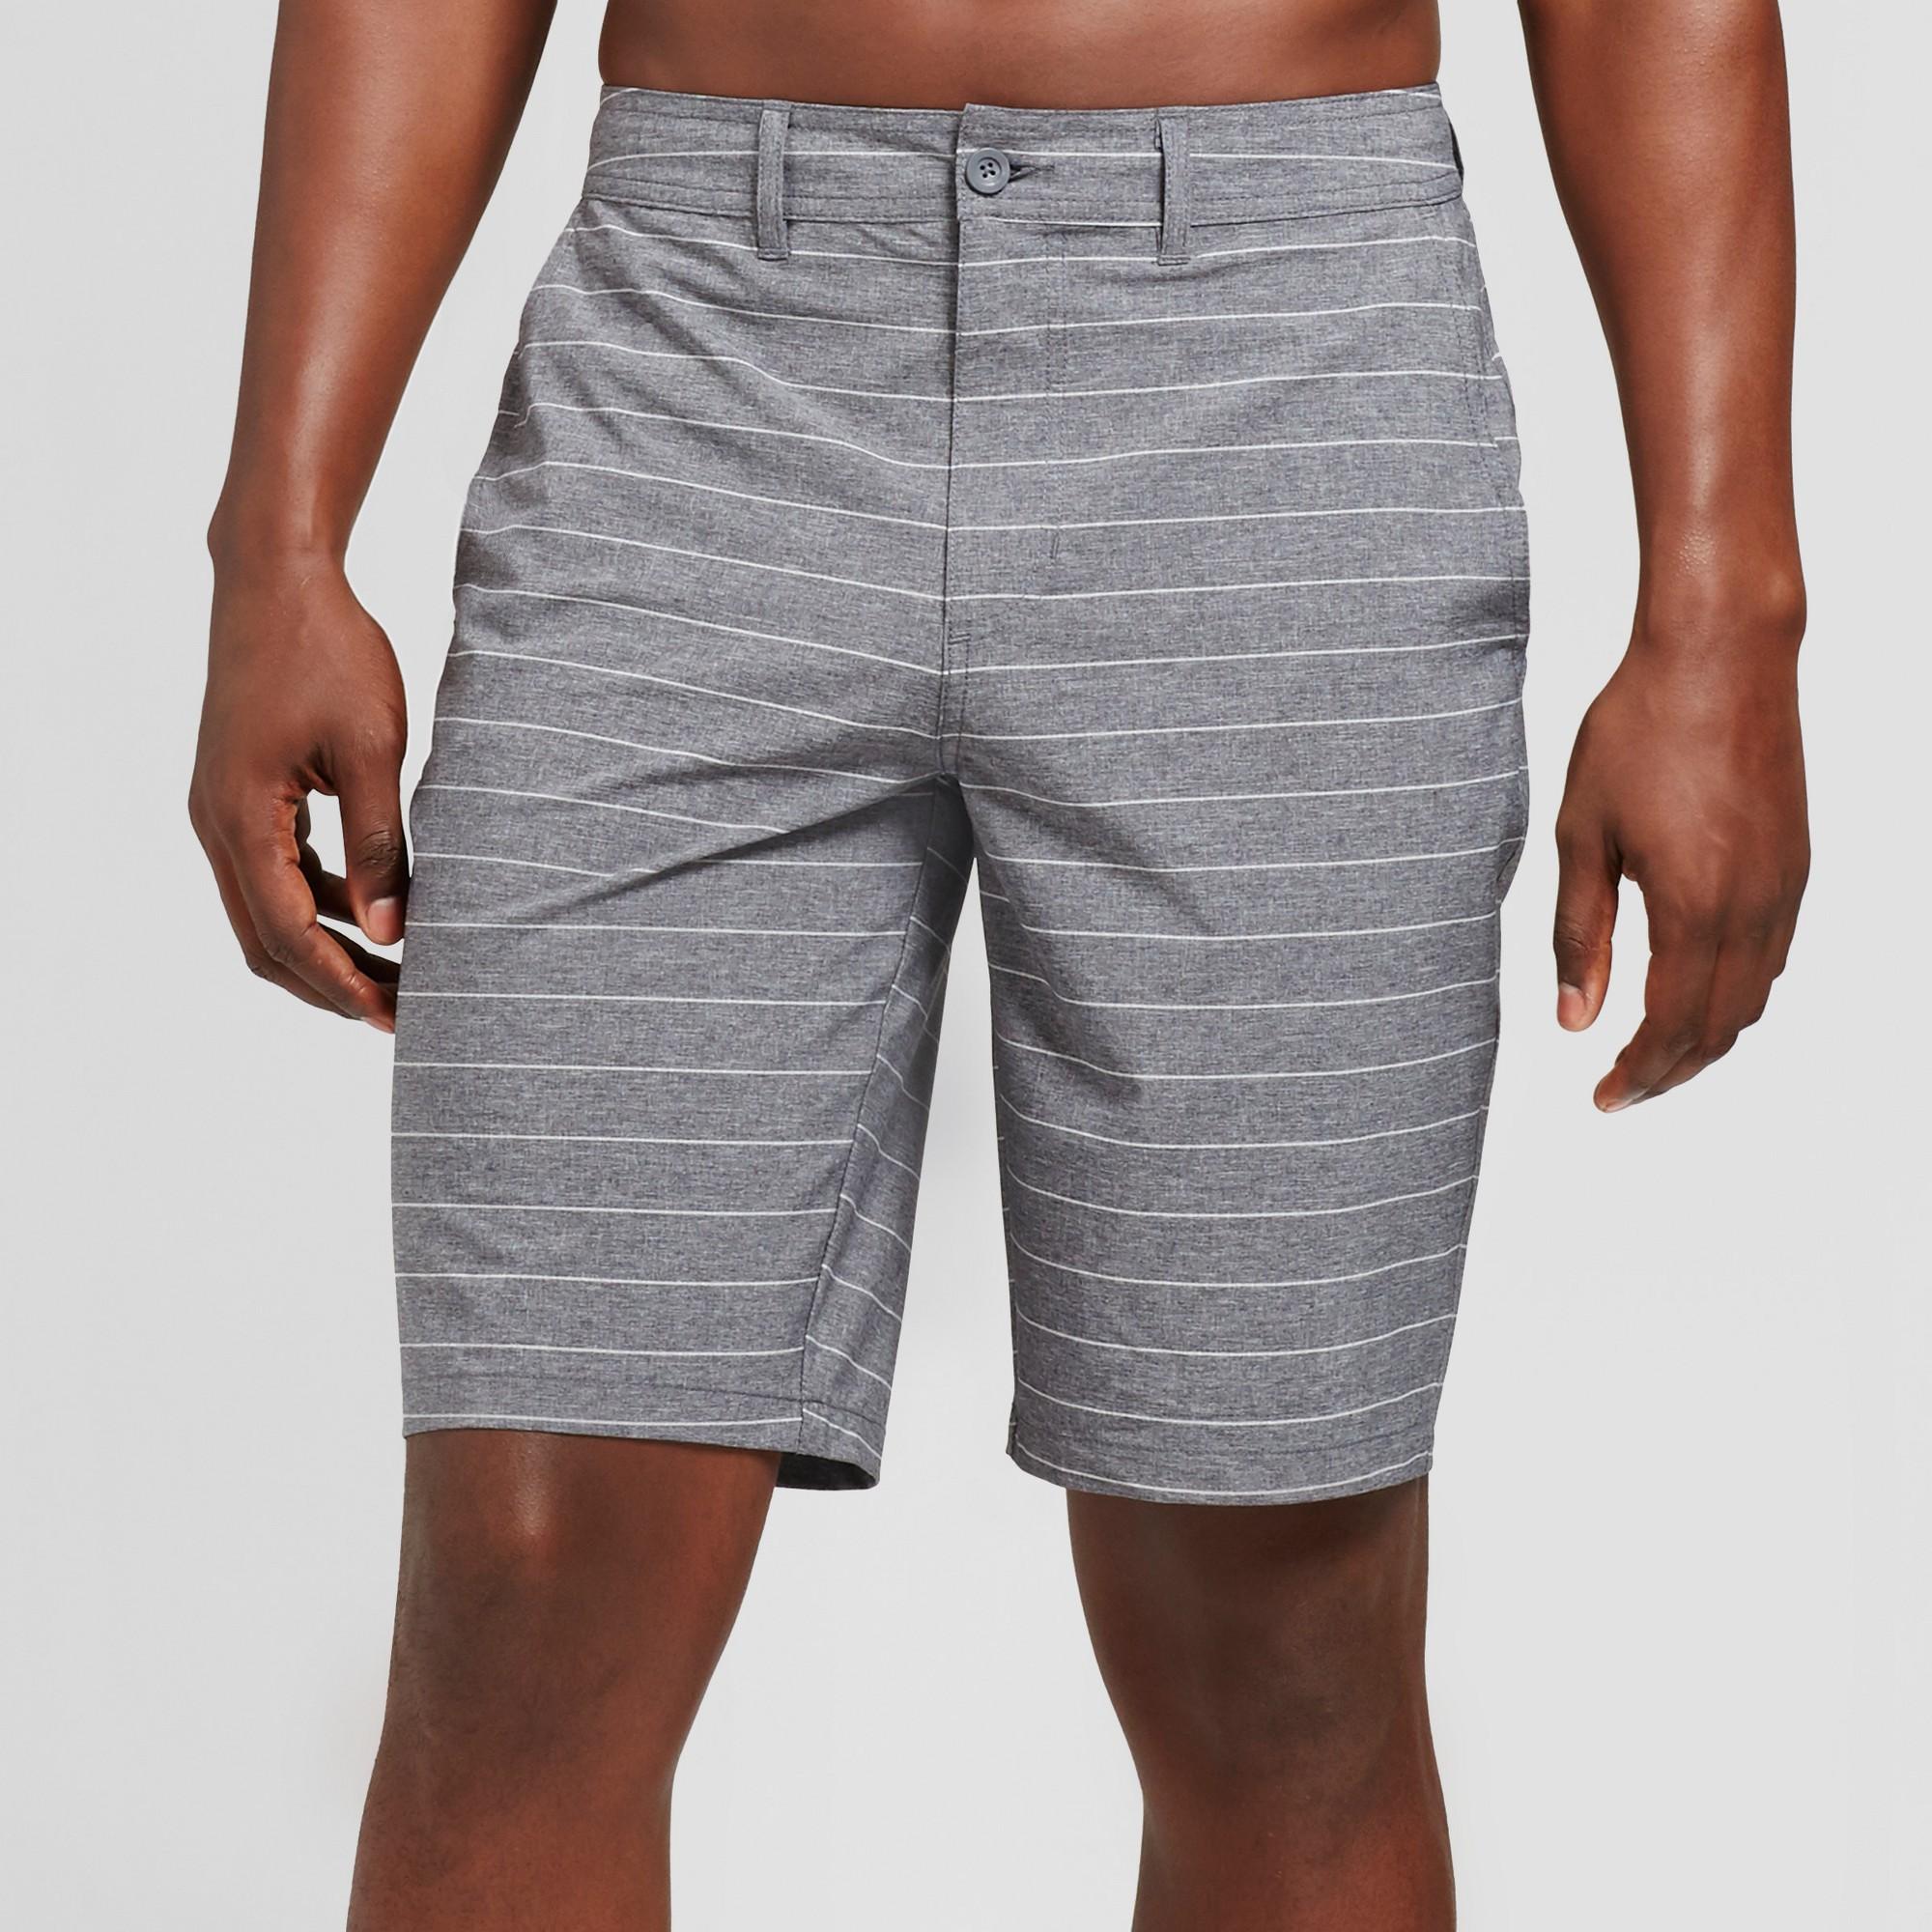 Men's 10.5 Current Stripe Hybrid Shorts - Goodfellow & Co Black 33